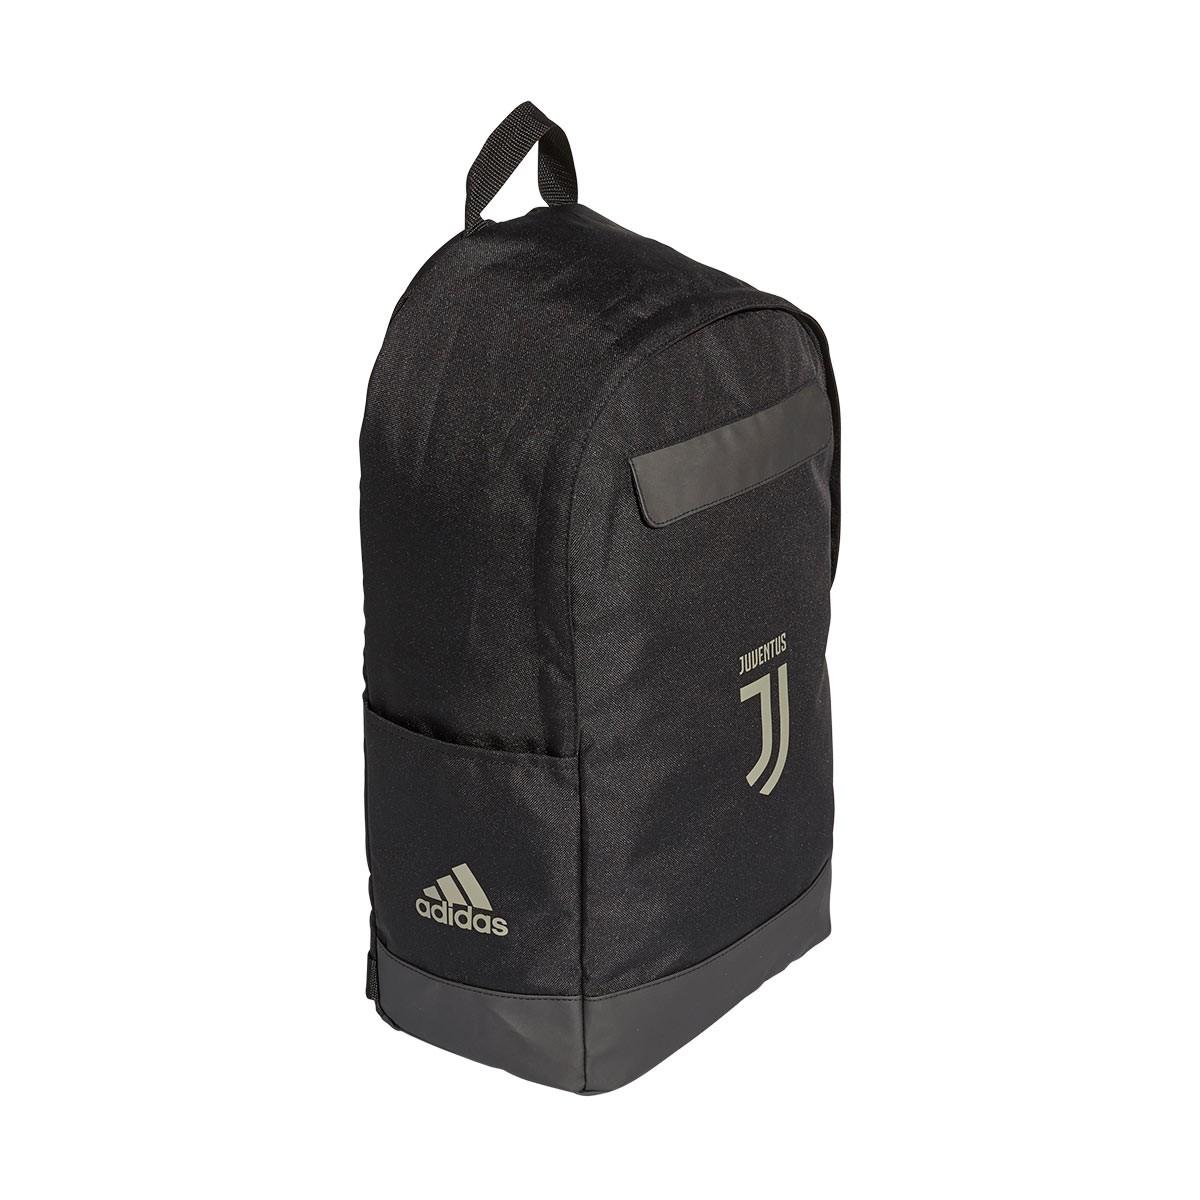 d6194b9f41 Mochila adidas Juventus BP Black-Clay - Loja de futebol Fútbol Emotion